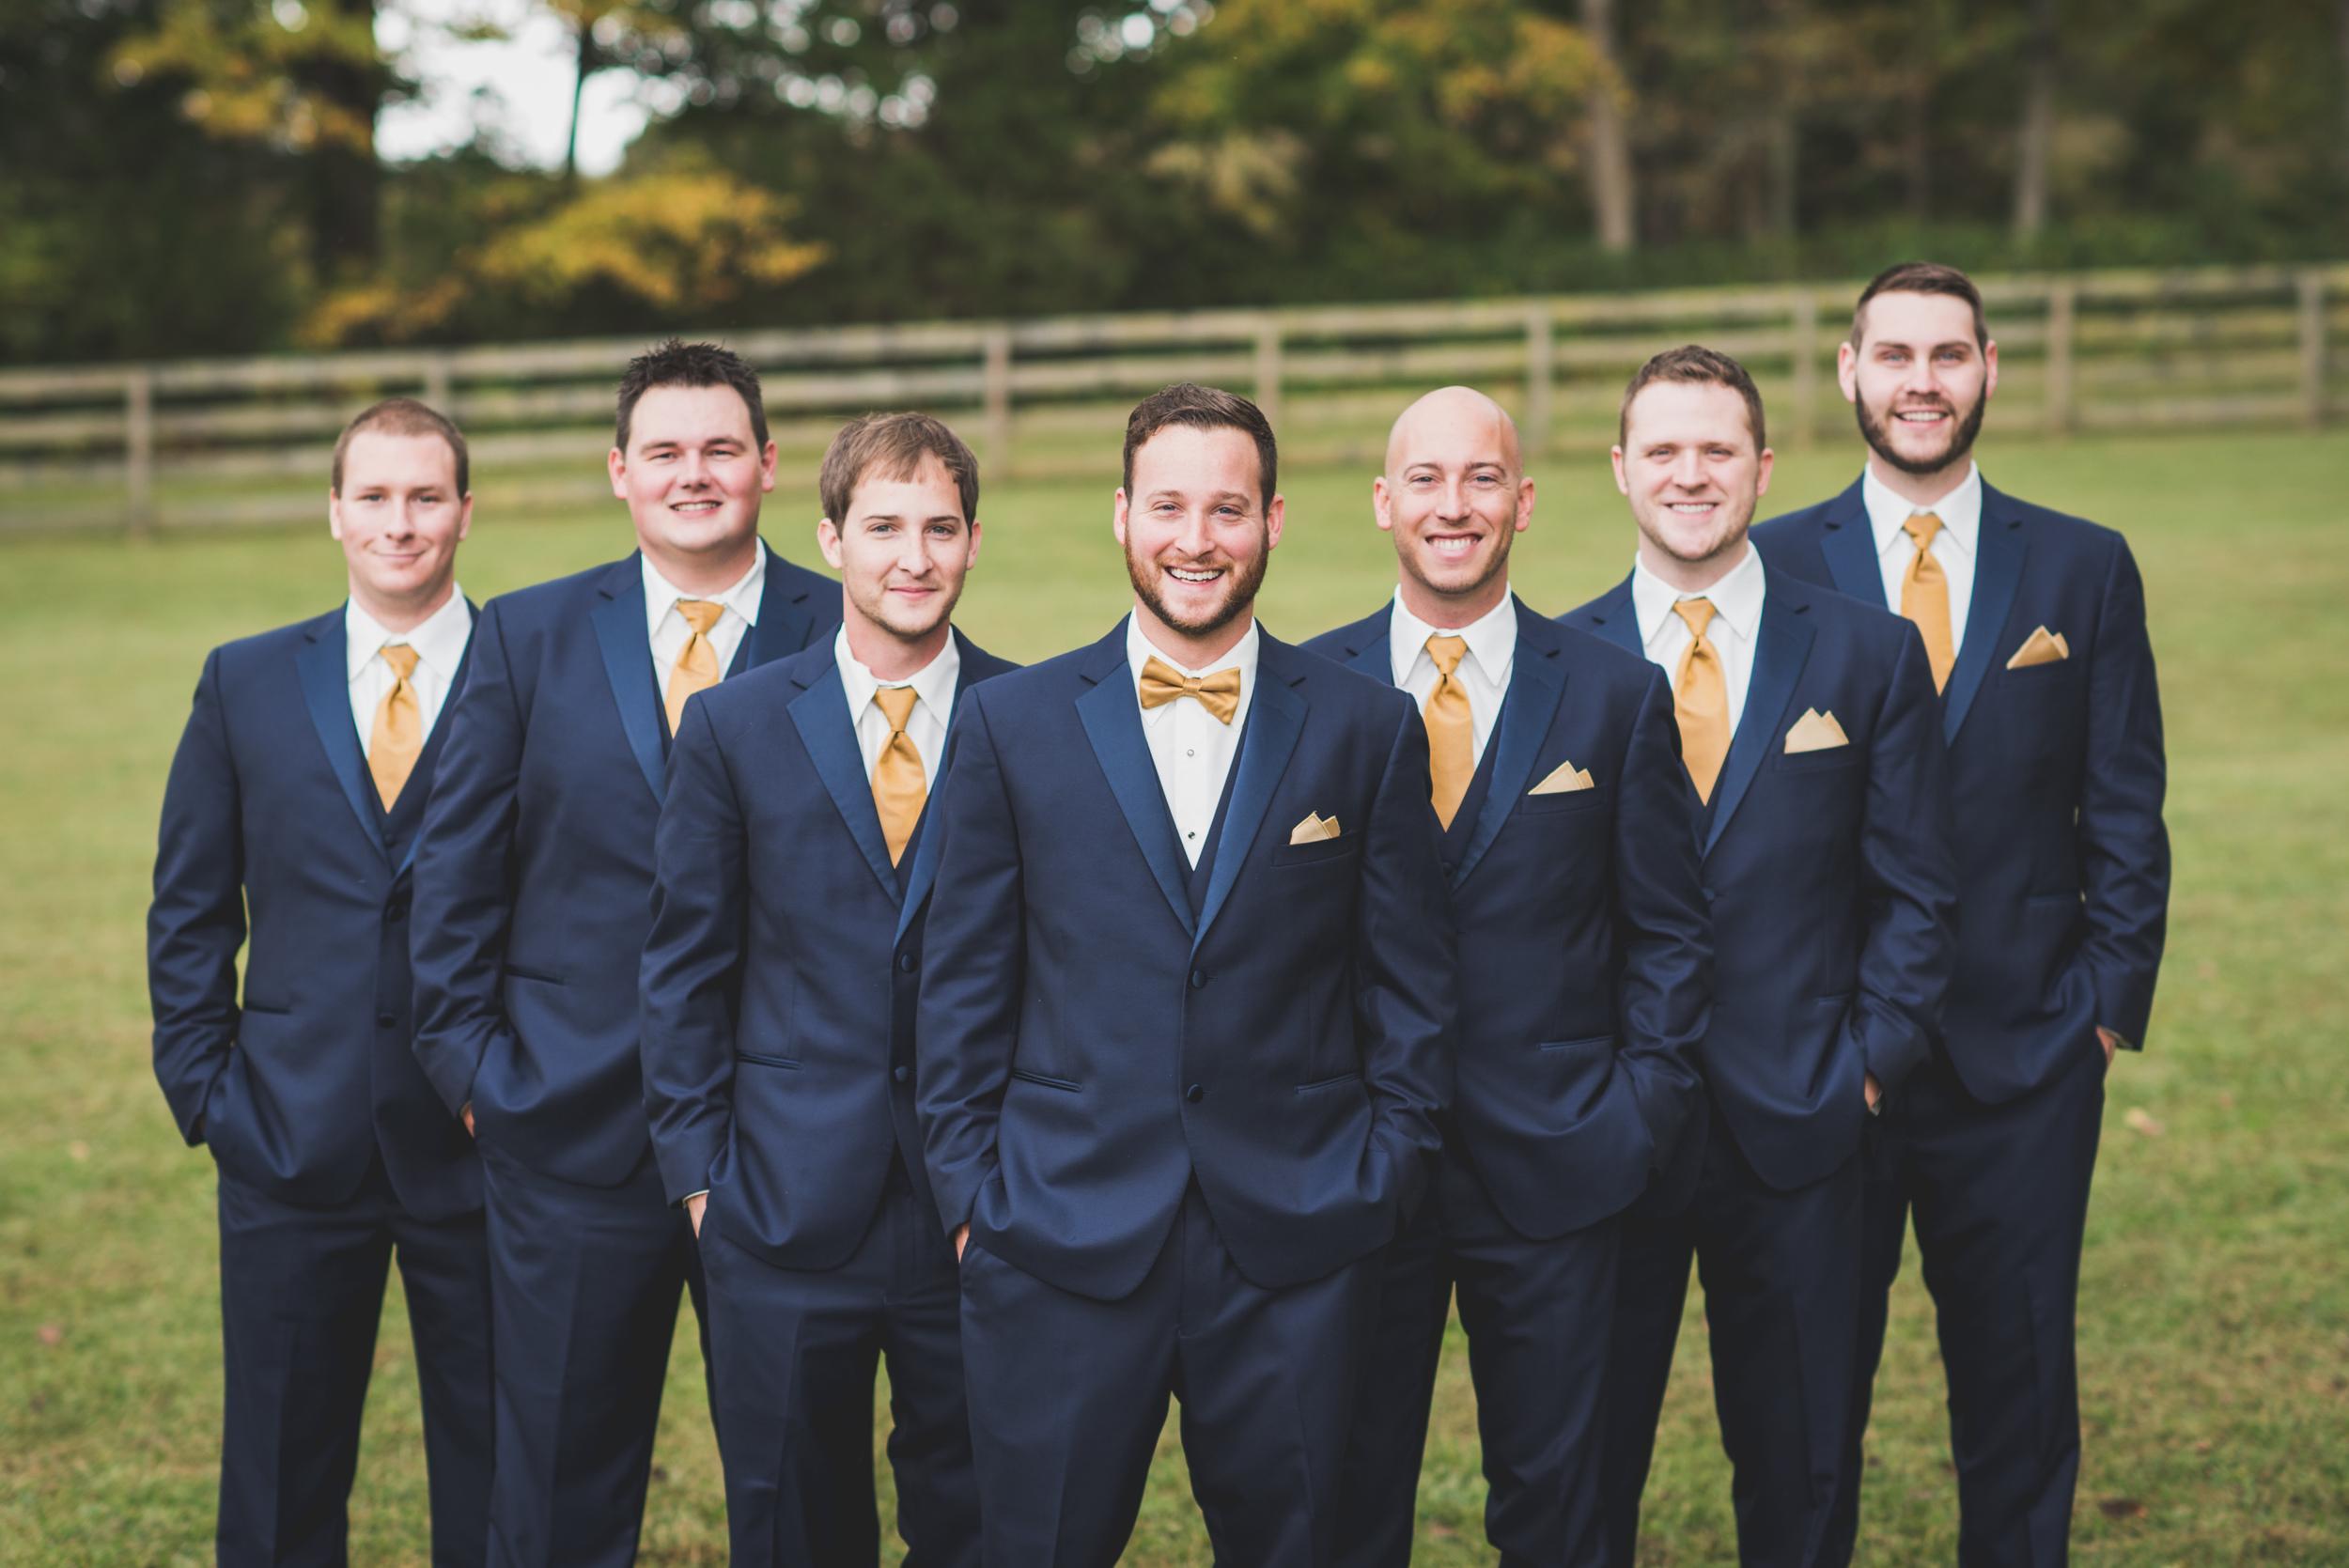 Duck Pond Farm Nashville Wedding Photographer-6.jpg